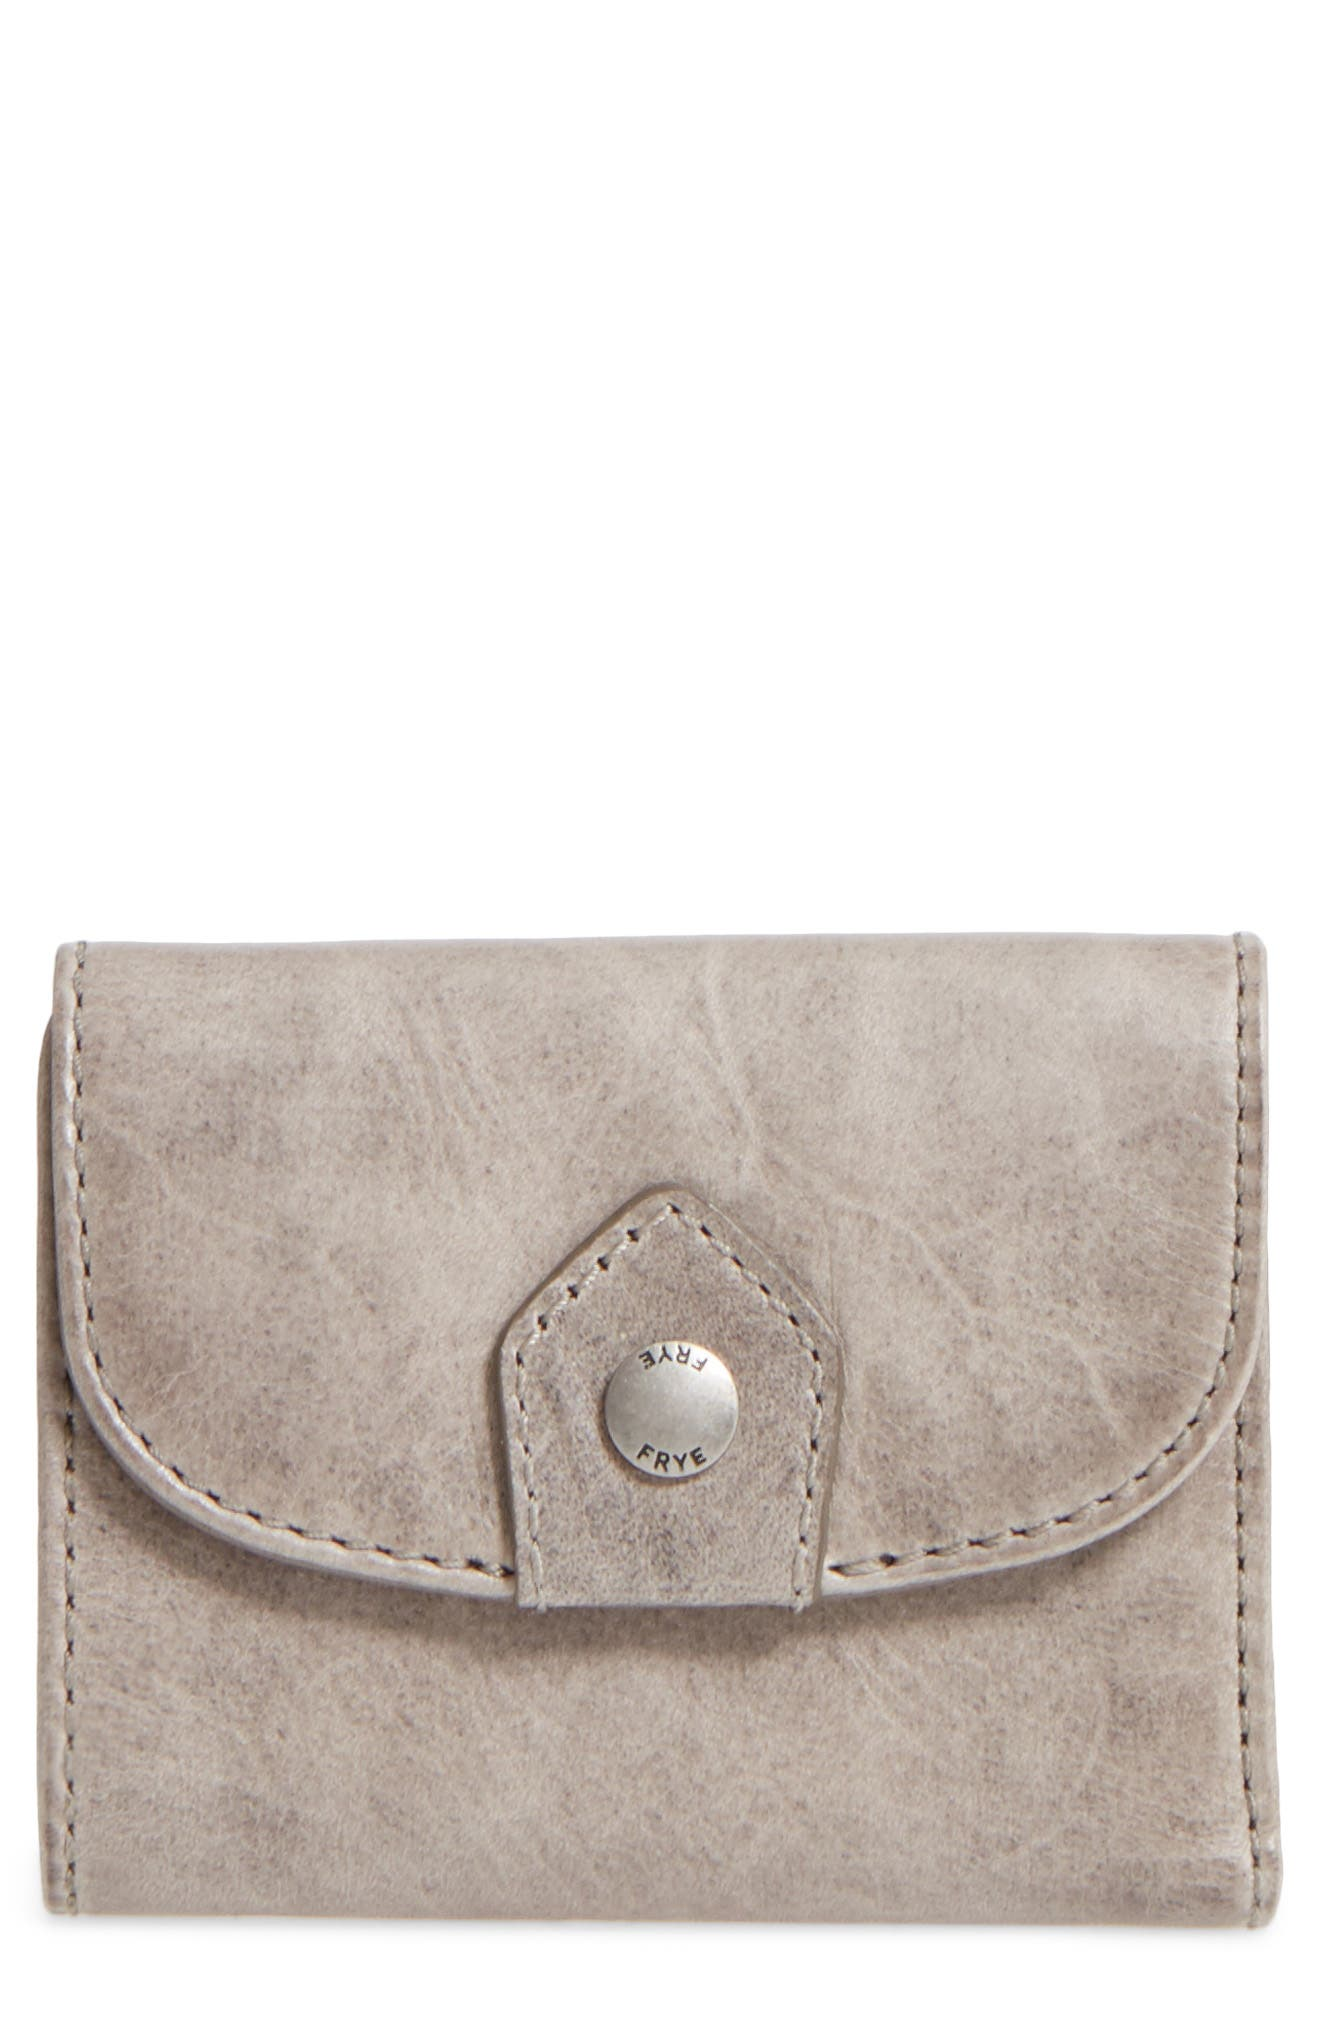 Melissa Medium Trifold Leather Wallet,                             Main thumbnail 1, color,                             020